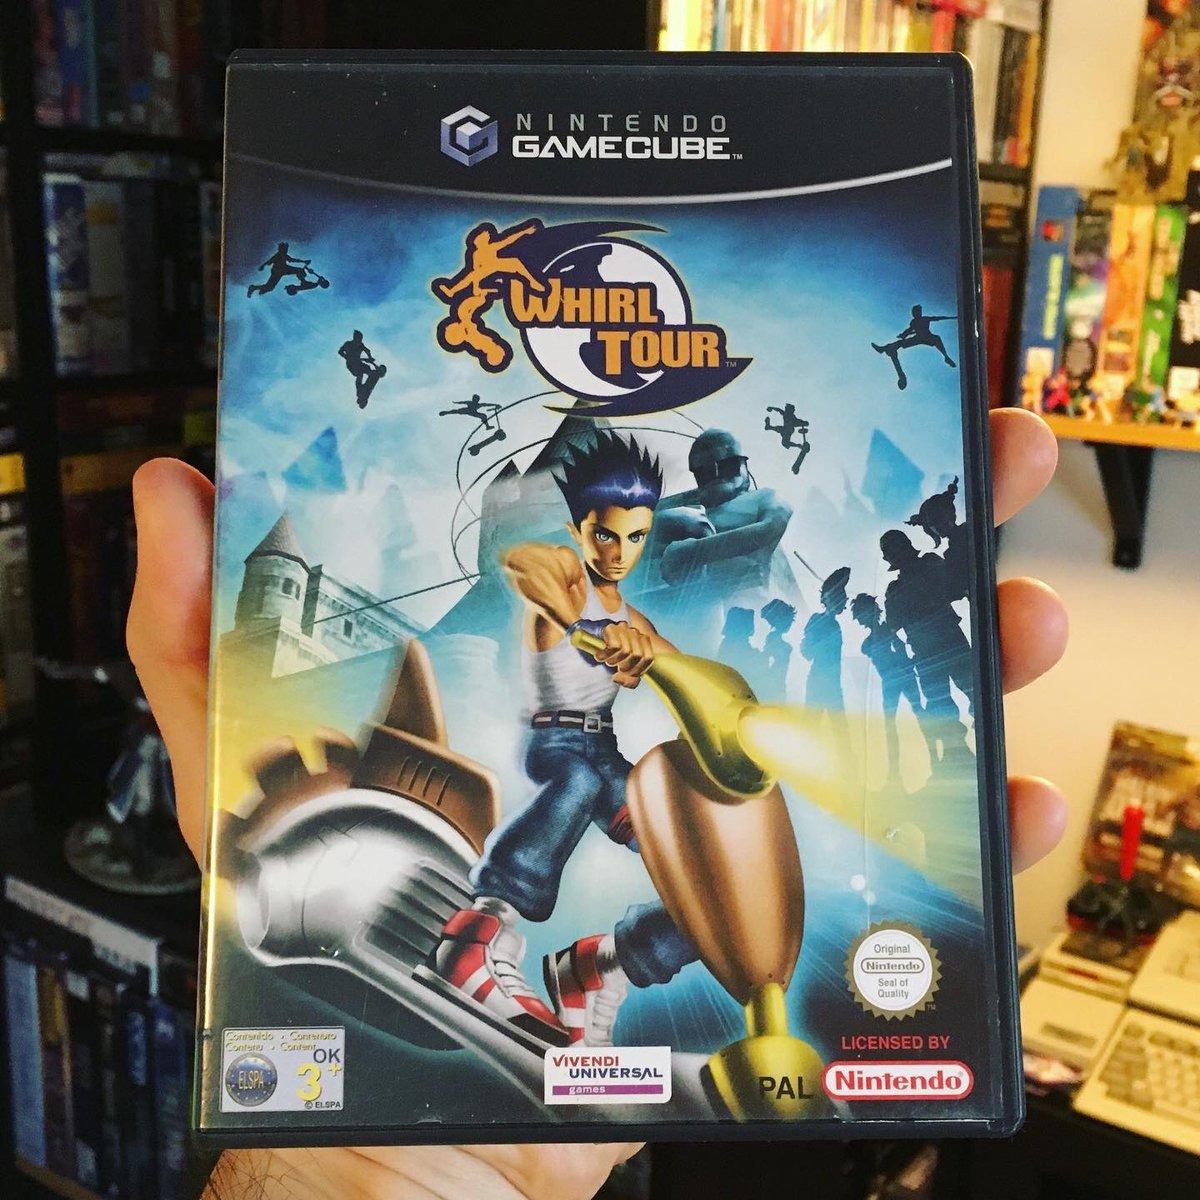 Whirl Tour - Vivendi Universal Games  - GameCube Scooter  Racing Game - 2002/03 #retrogaming #retrogames #retrogamer #scootering #gamer #gaming #whirltour #popculture #nintendogames #nintendogamer #gamecube #nintendogamecube #consolegames #nintendo #videogamespic.twitter.com/pjfVU86d05